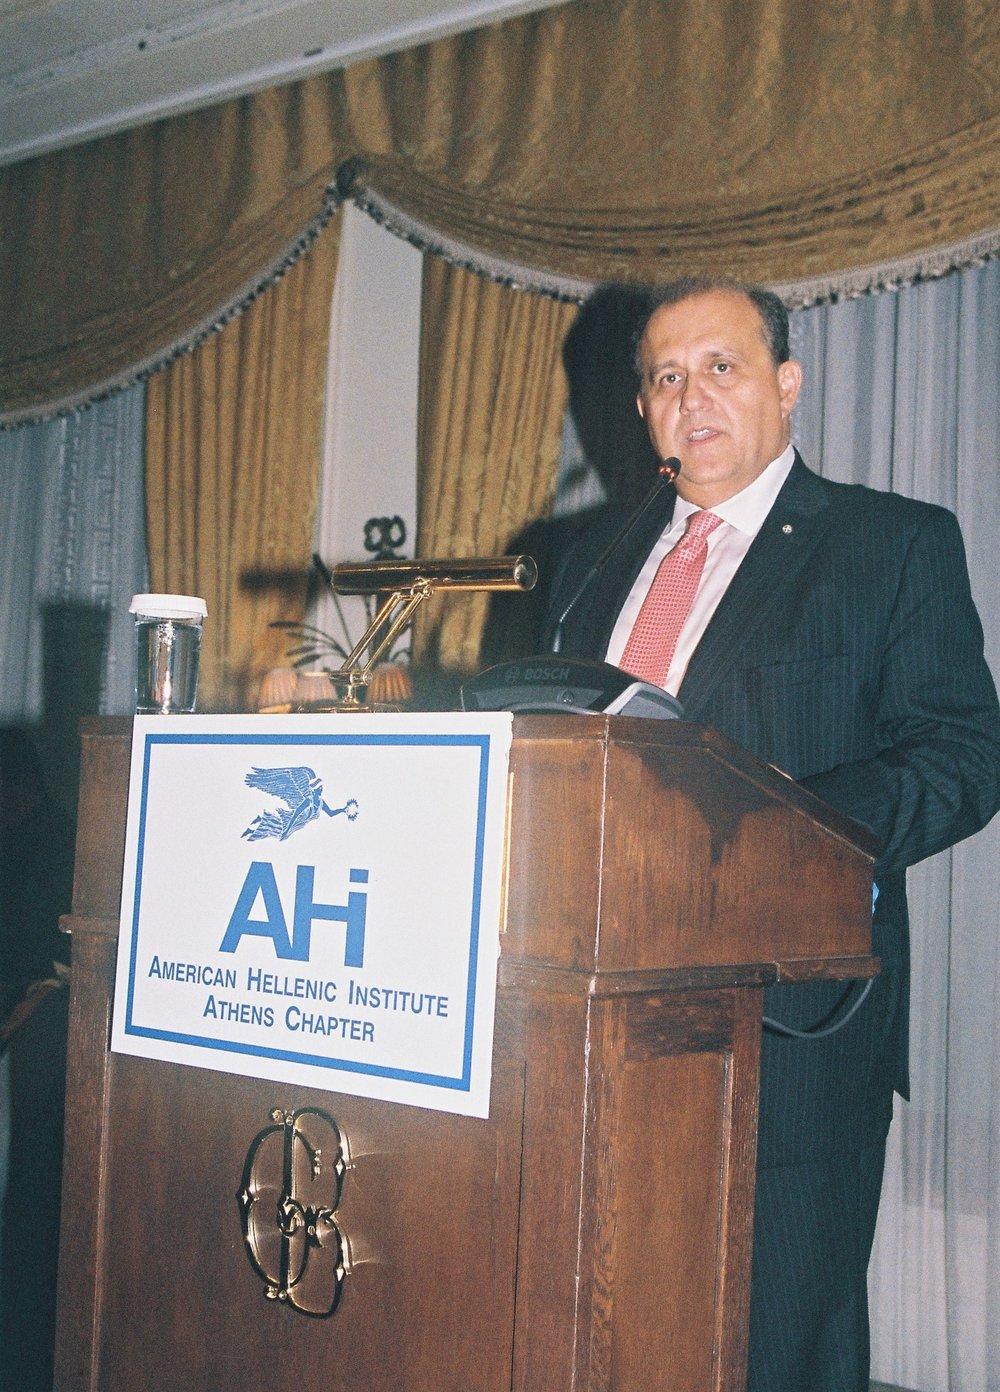 Nick Larigakis, President of AHI.